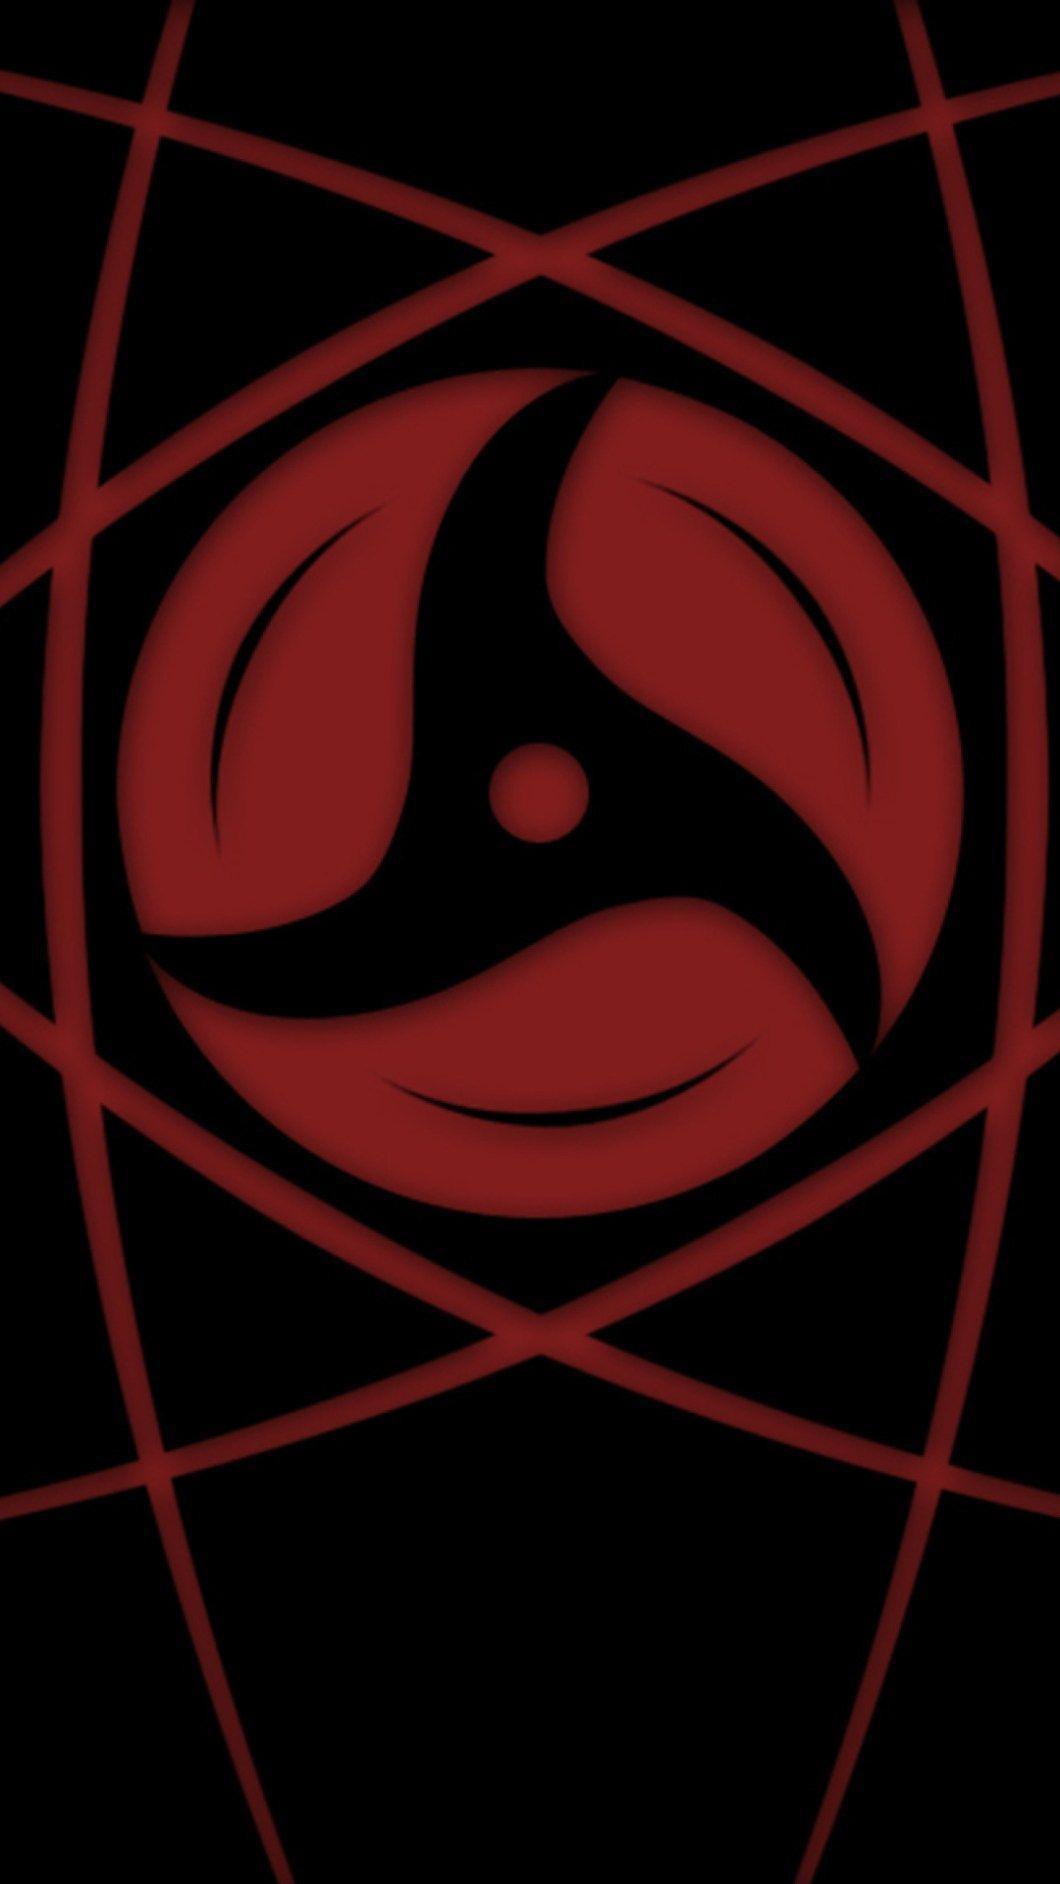 Naruto Iphone Wallpapers Top Free Naruto Iphone